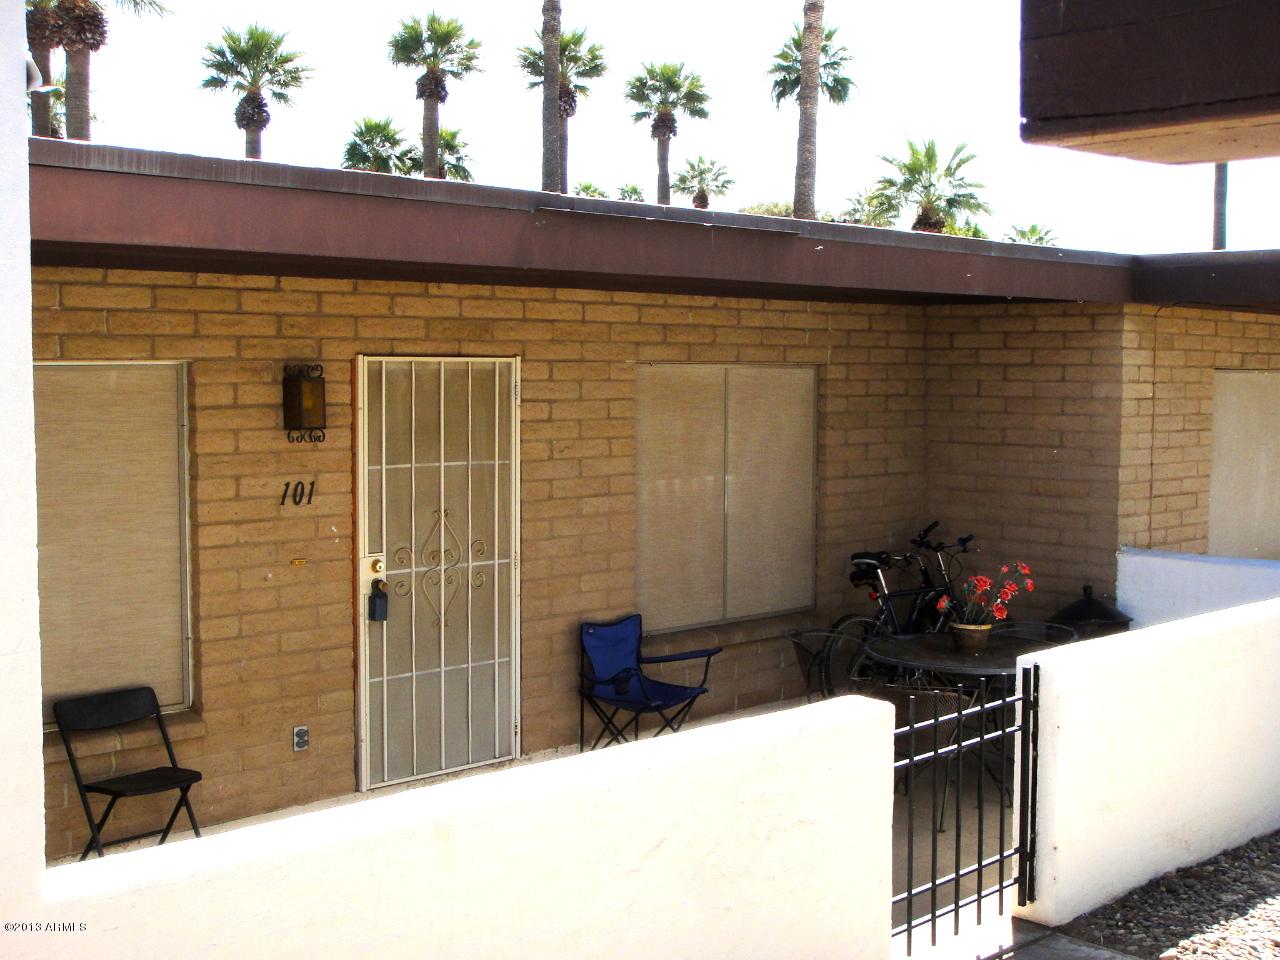 Photo of 220 S OLD LITCHFIELD Road #101, Litchfield Park, AZ 85340